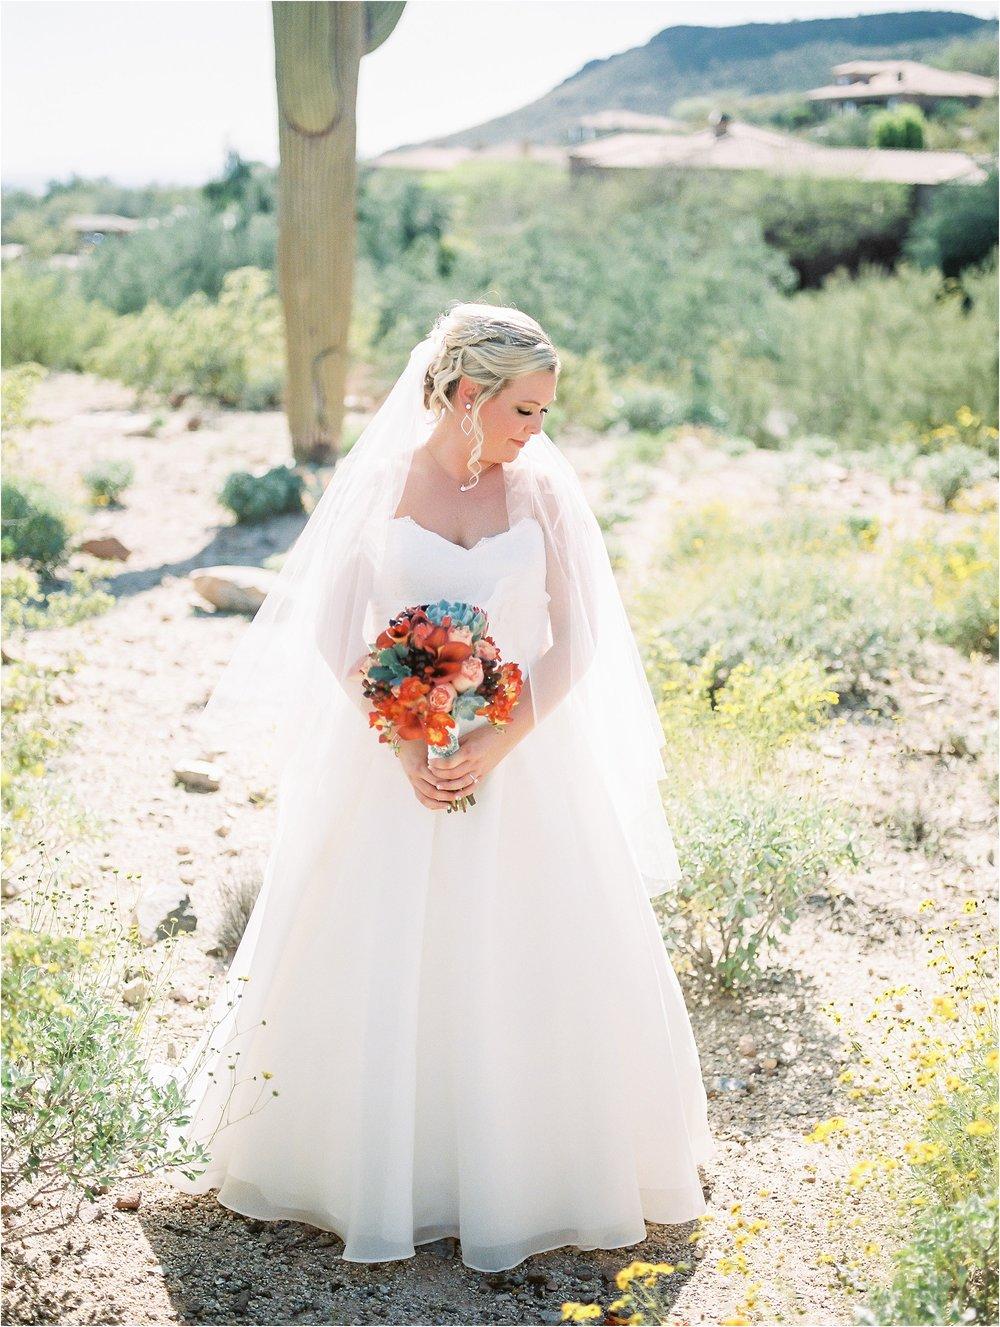 Sarah Jane Photography Film Hybrid Scottsdale Phoenix Arizona Destination Wedding Photographer Scott and Rachel_0015.jpg